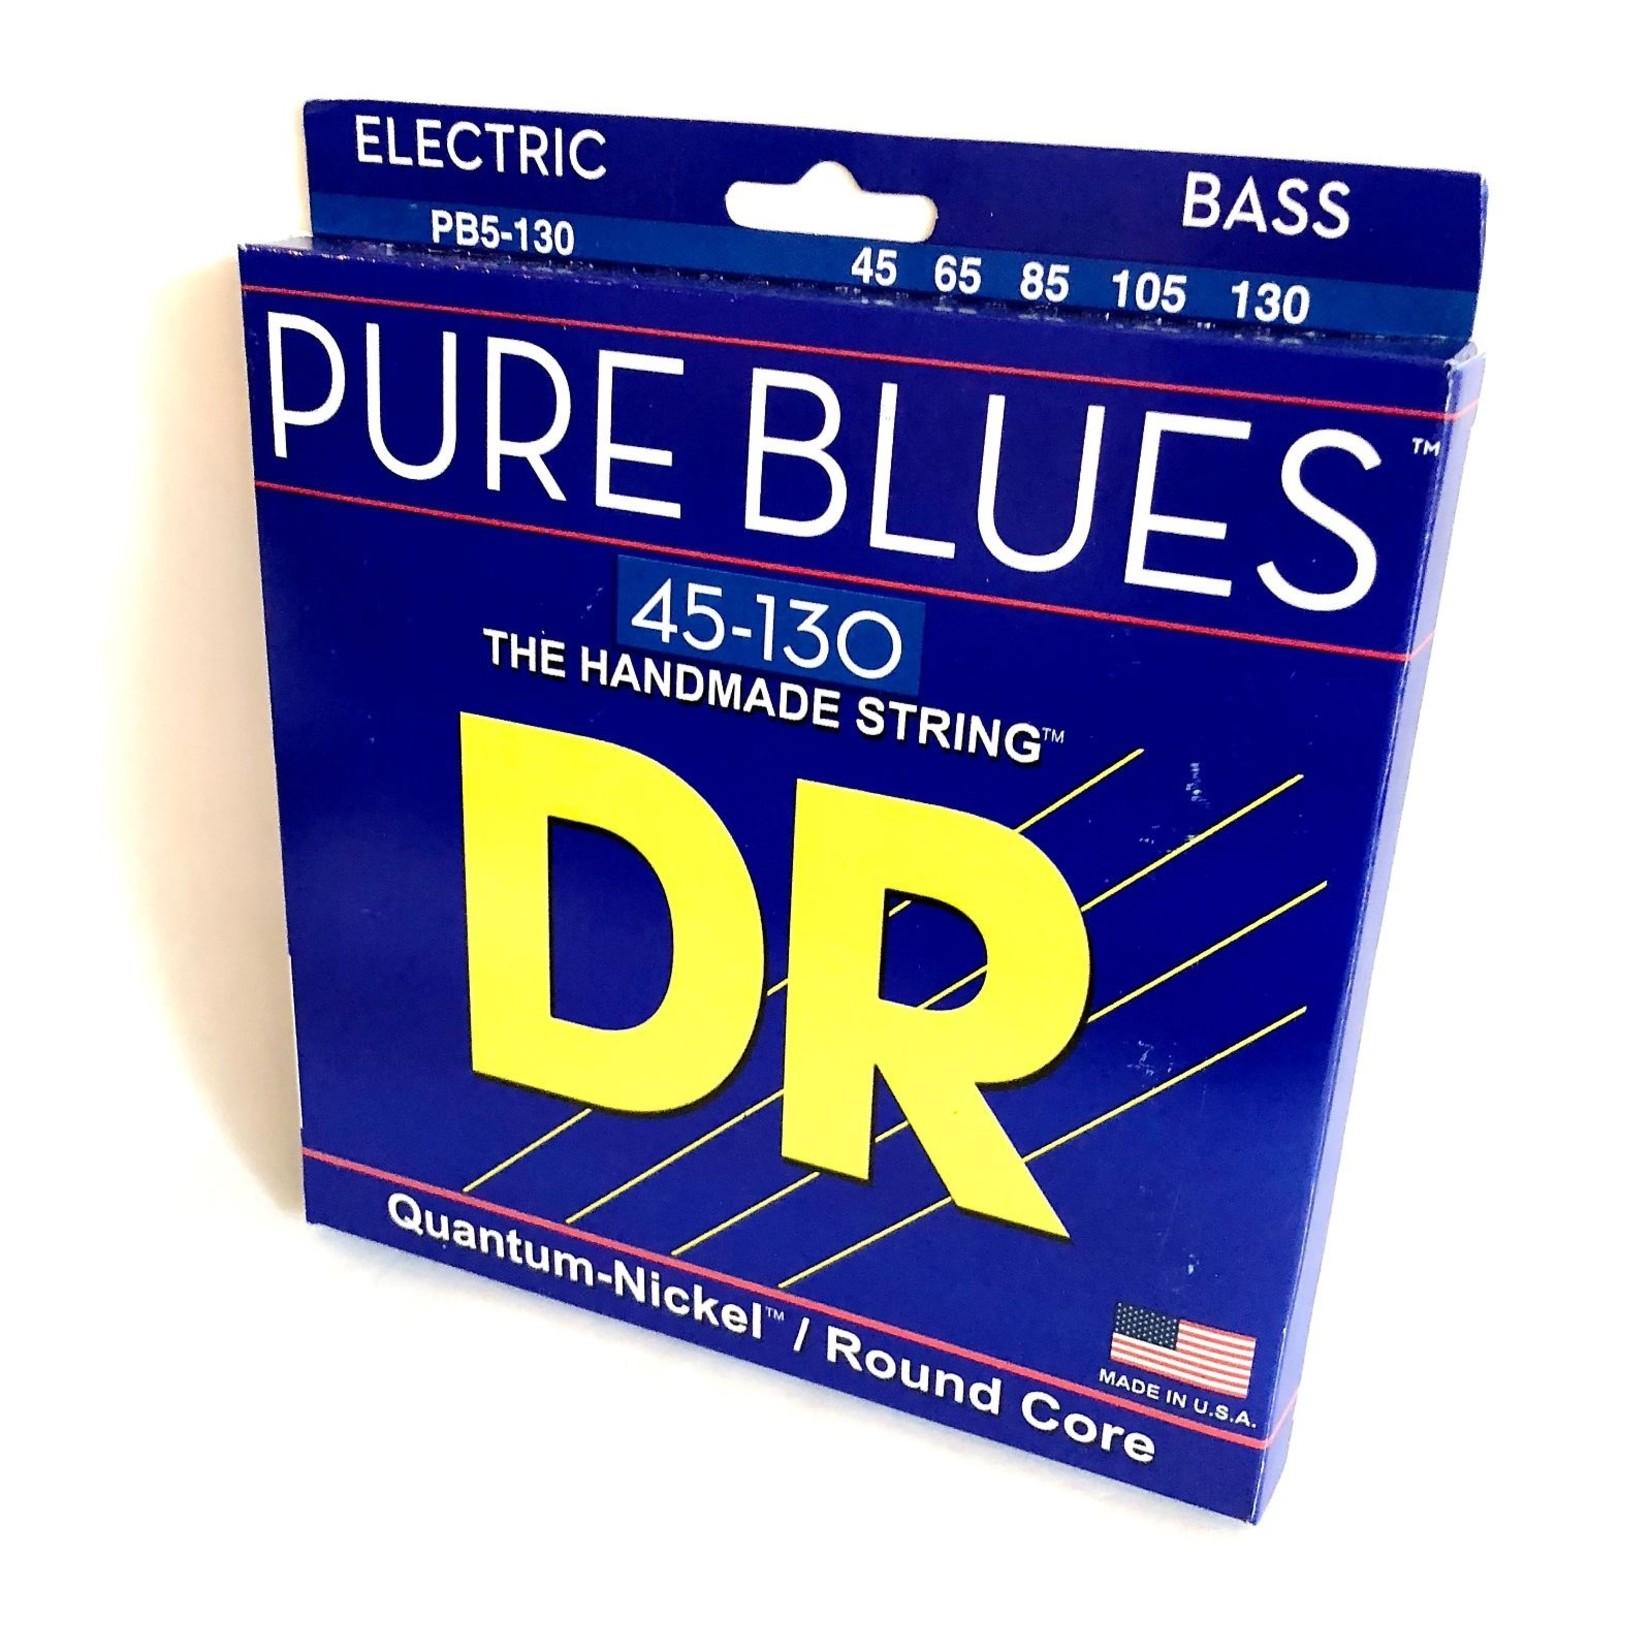 DR Strings DR Strings PB5-130 Pure Blues Bass 5-String Set (45 65 85 105 130), Quantum-Nickelª / Round Core